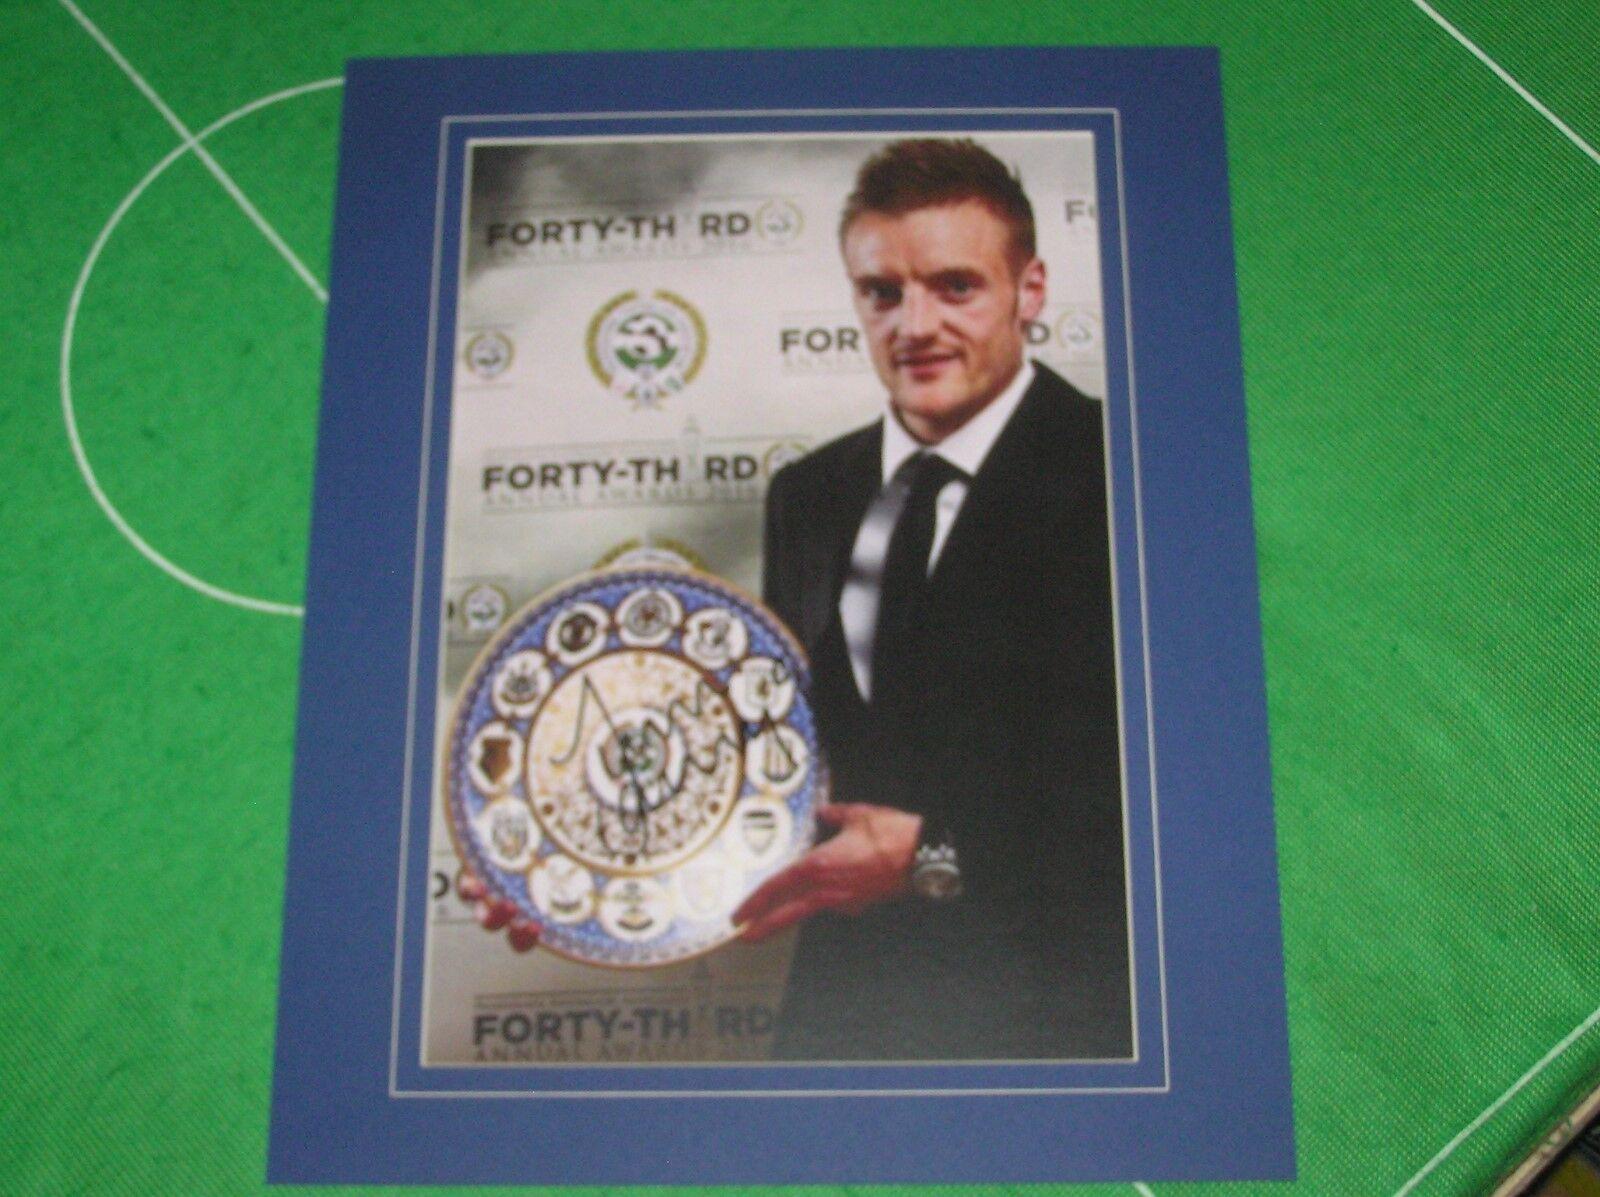 Jamie Vardy Signé & Monté Leicester City' 11 In 11' 11' 11' Record Pfa Award Photo bd5317